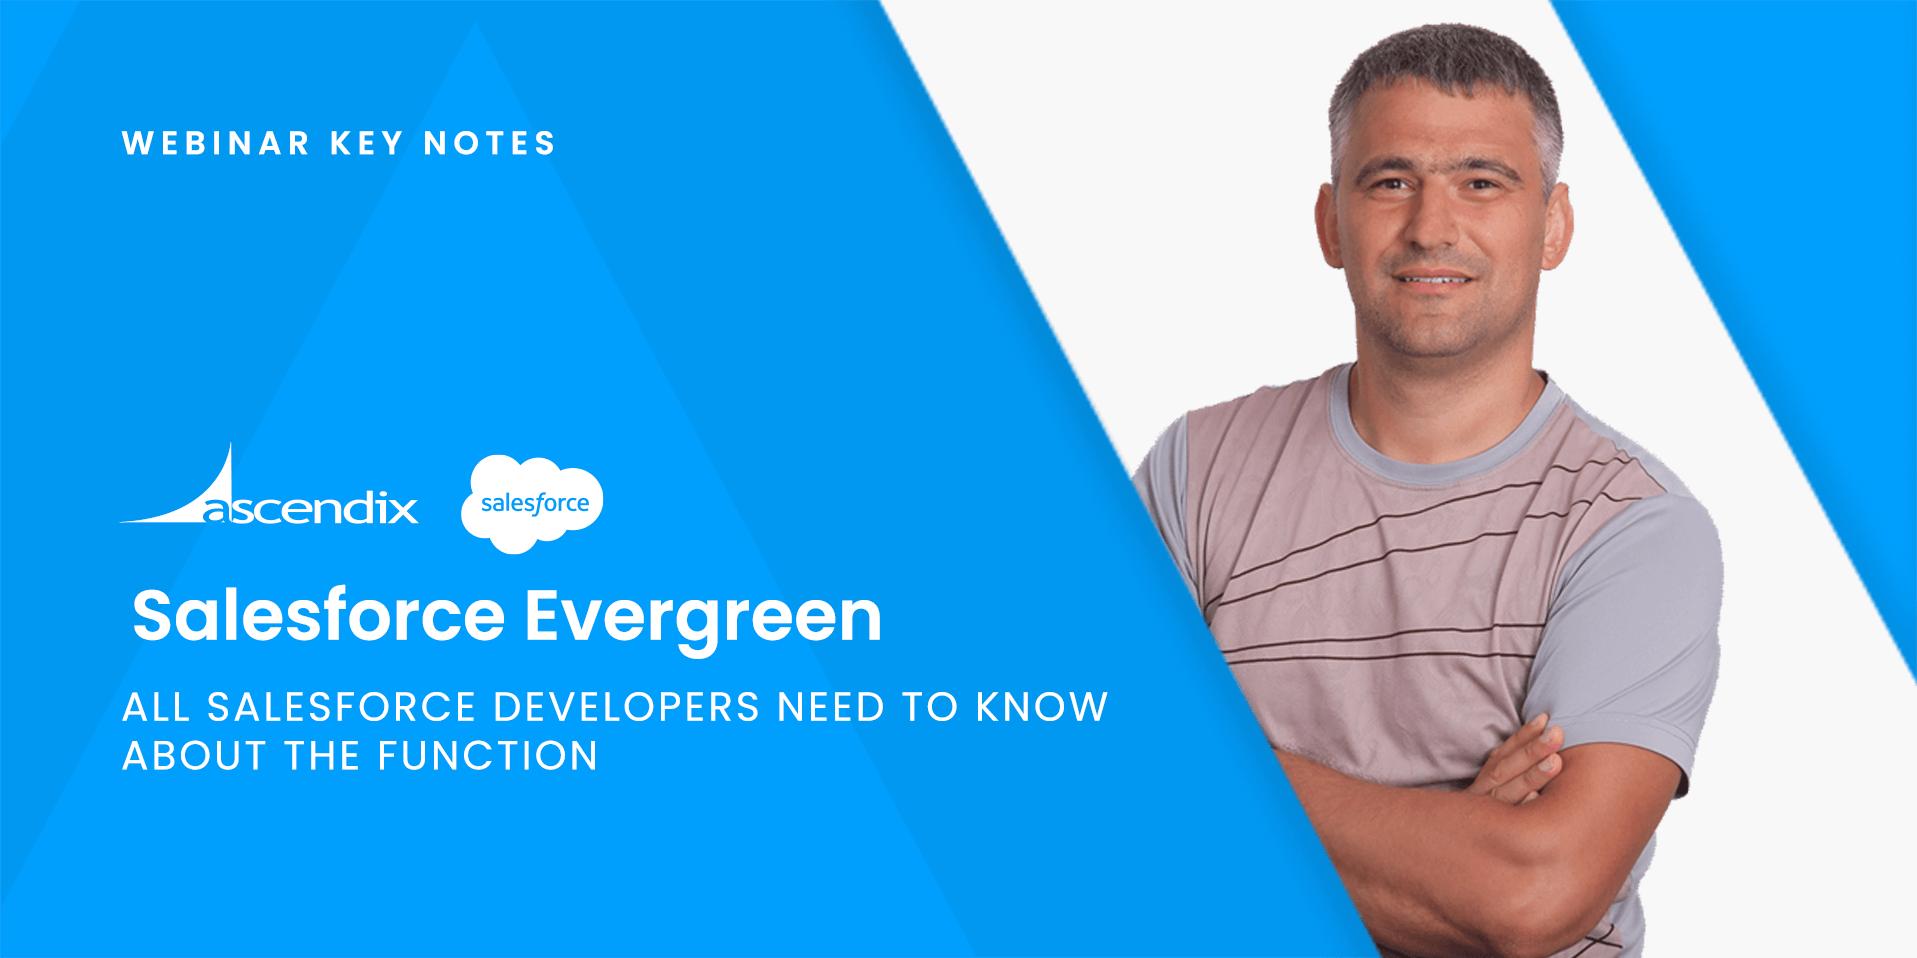 Salesforce-Evergreen-Webinar-Notes